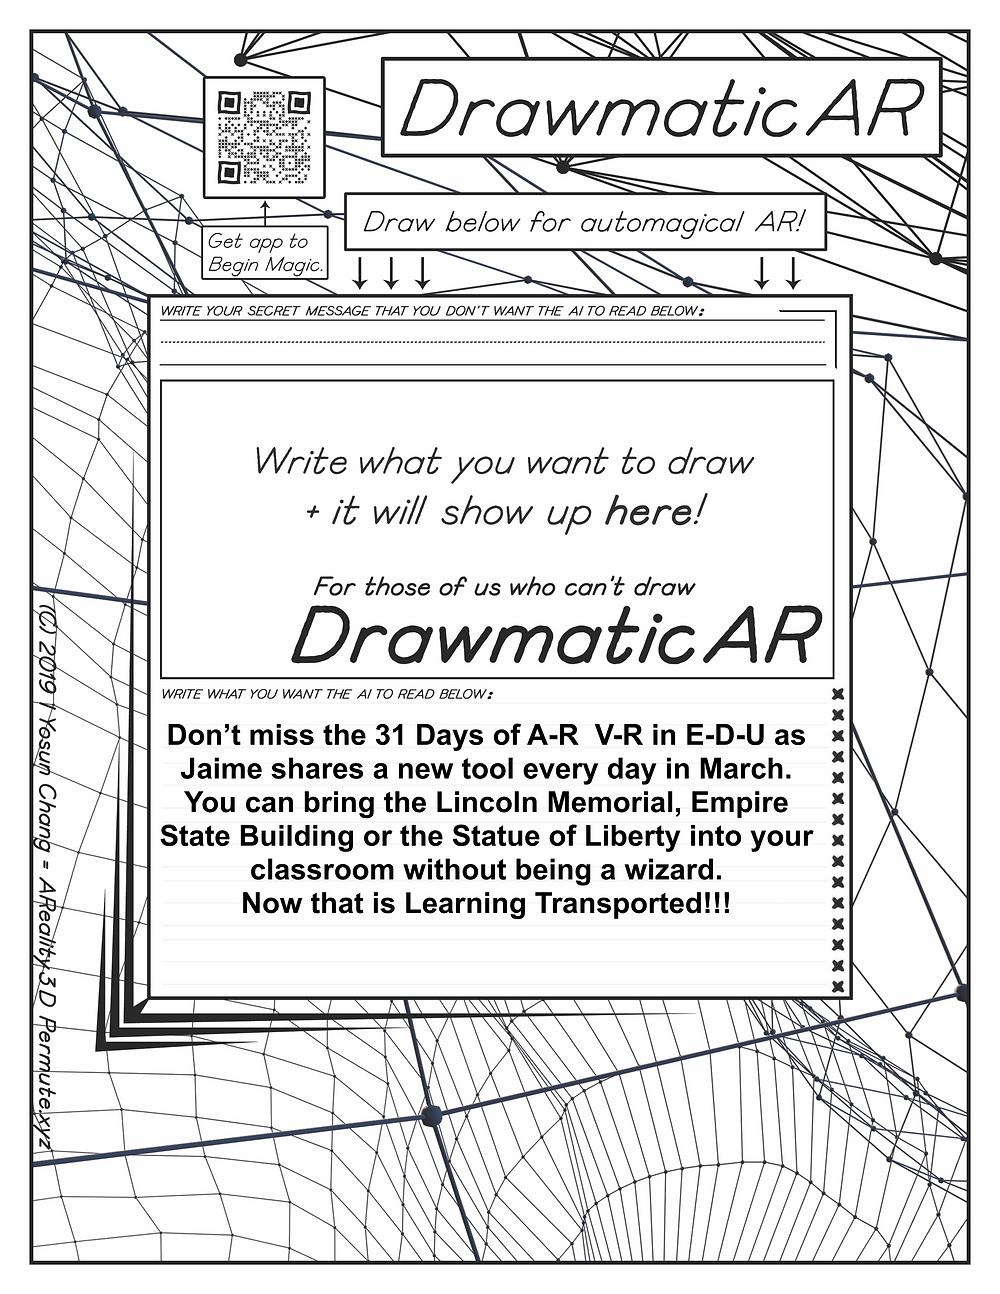 DrawmaticAR Example